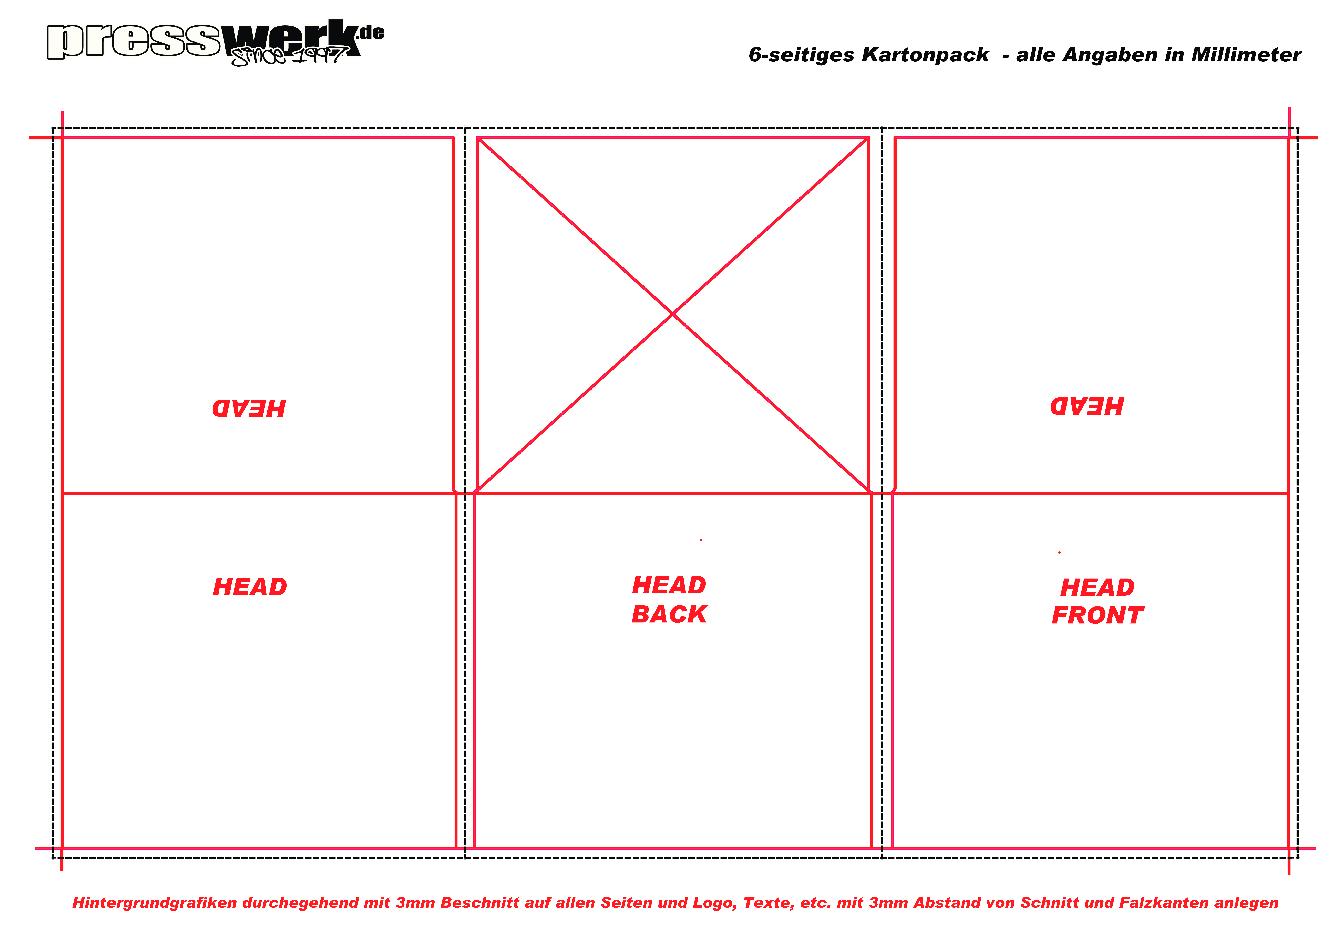 presswerk_de-CD-6s-Kartonpack_1Tray_template_300dpi CMYK.pdf